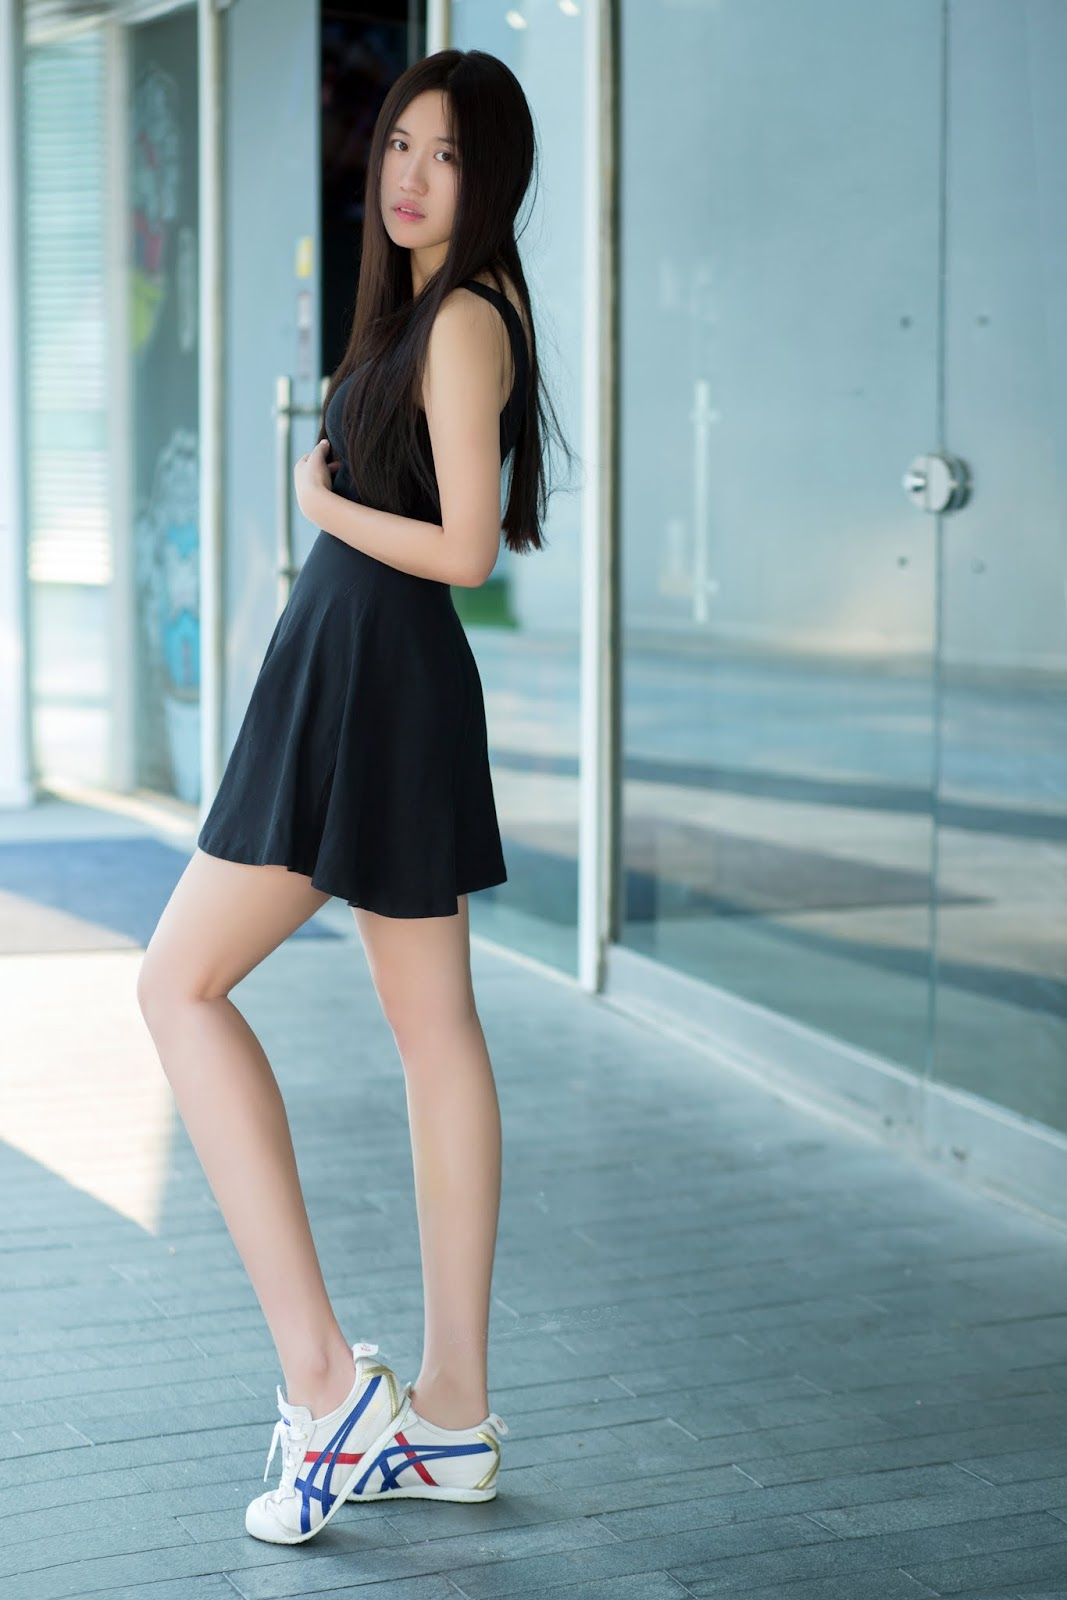 Jessica%2B%252832%2529 - TuiGirl No.60